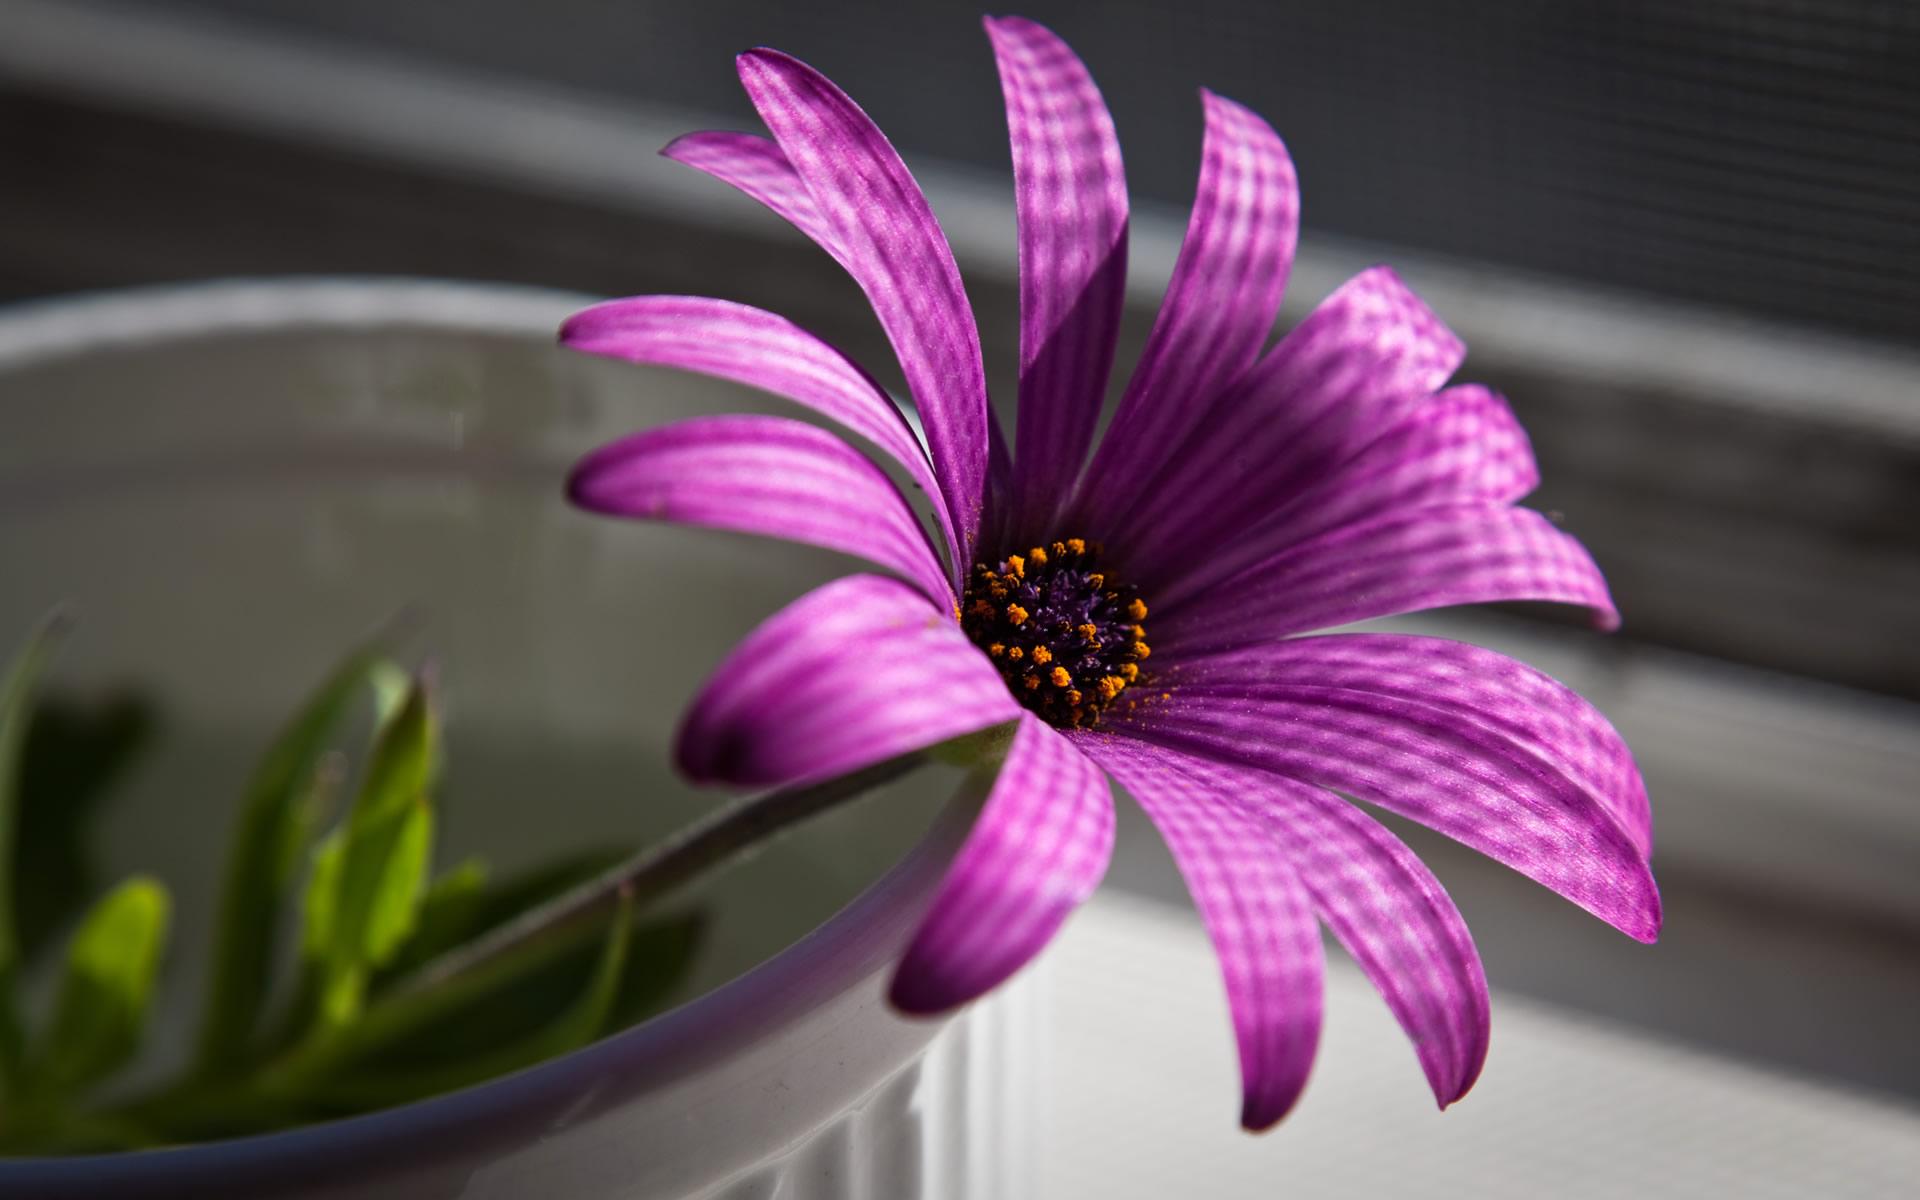 Purple and white wallpaper wallpapersafari download white purple flower wallpapers we provide the best 1920x1200 mightylinksfo